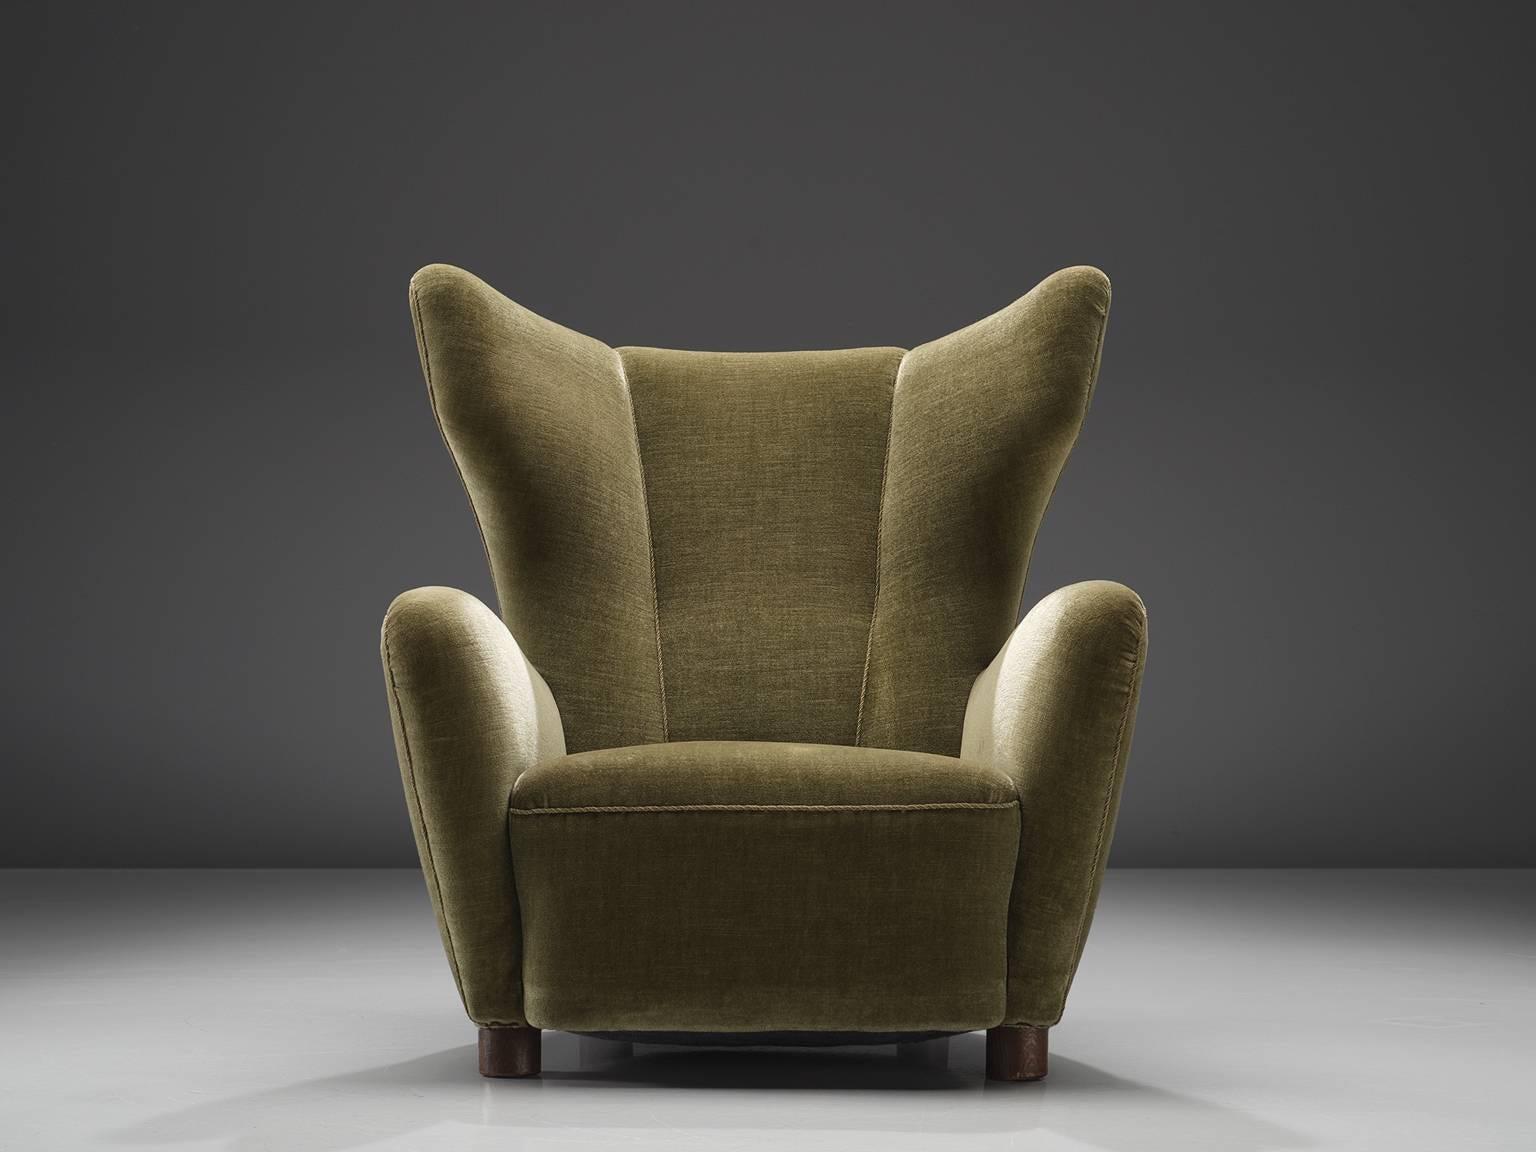 Danish Cabinetmaker, Wingback Chair, Mahogany, Green Velvet Fabric,  Denmark, Circa 1940